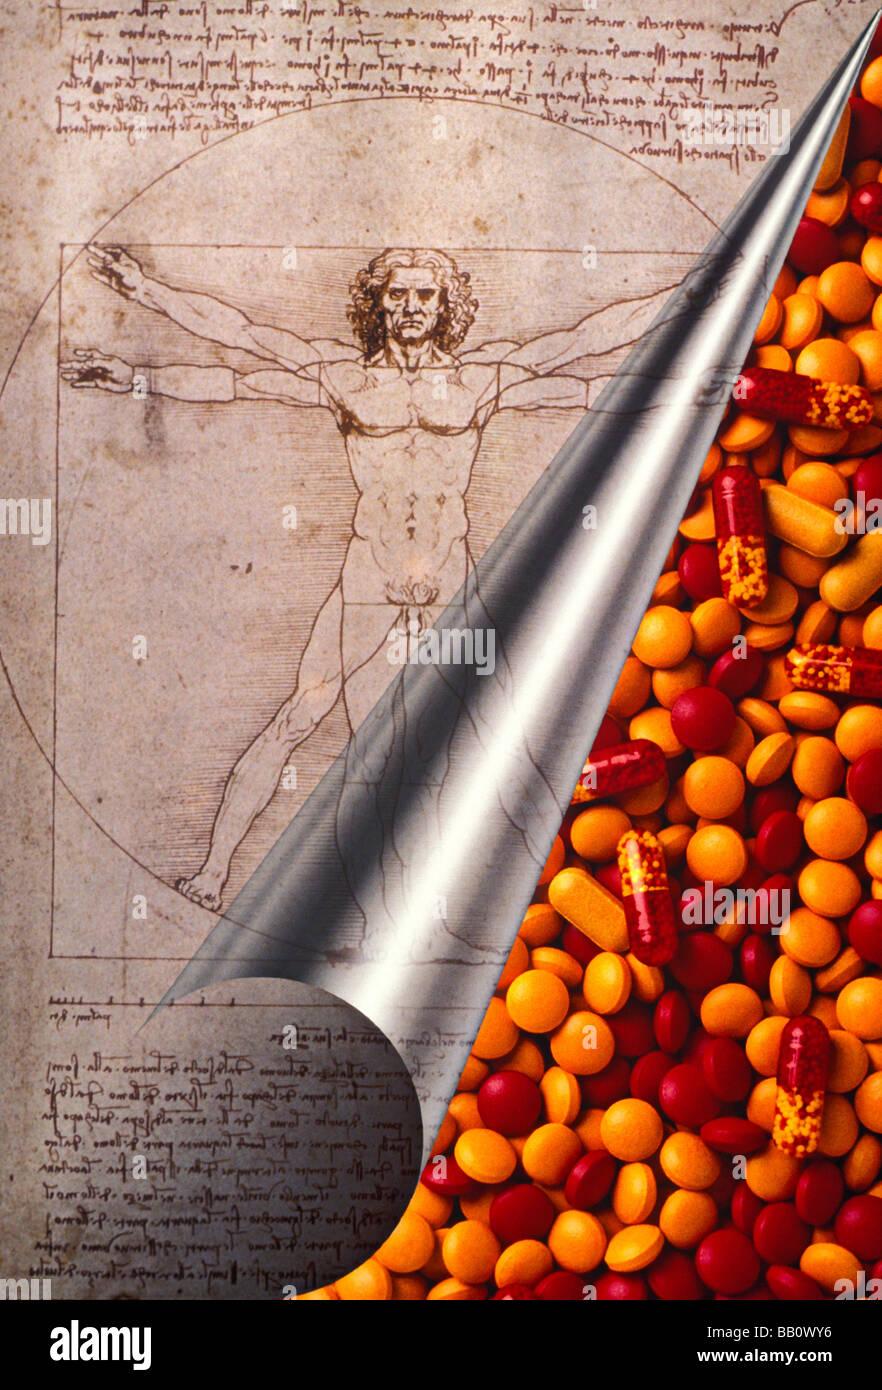 Leonardo Da Vinci curl Seite mit Pillen Stockfoto